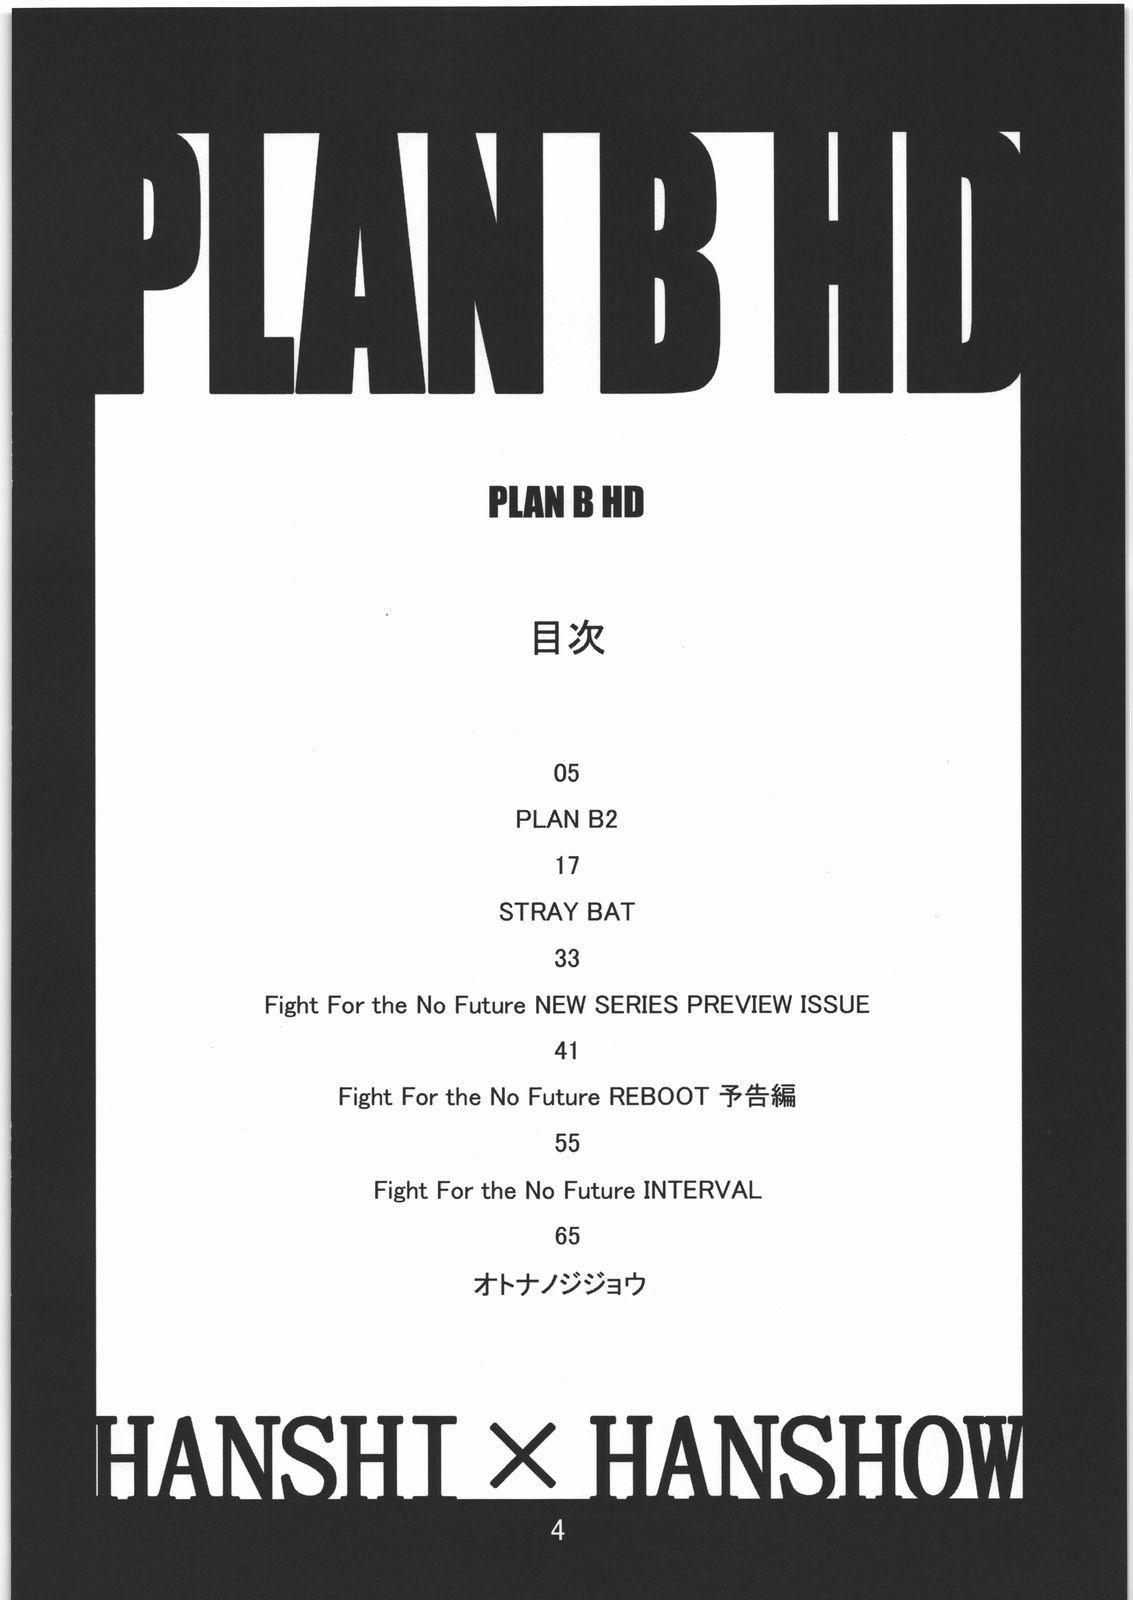 PLAN B HD 2